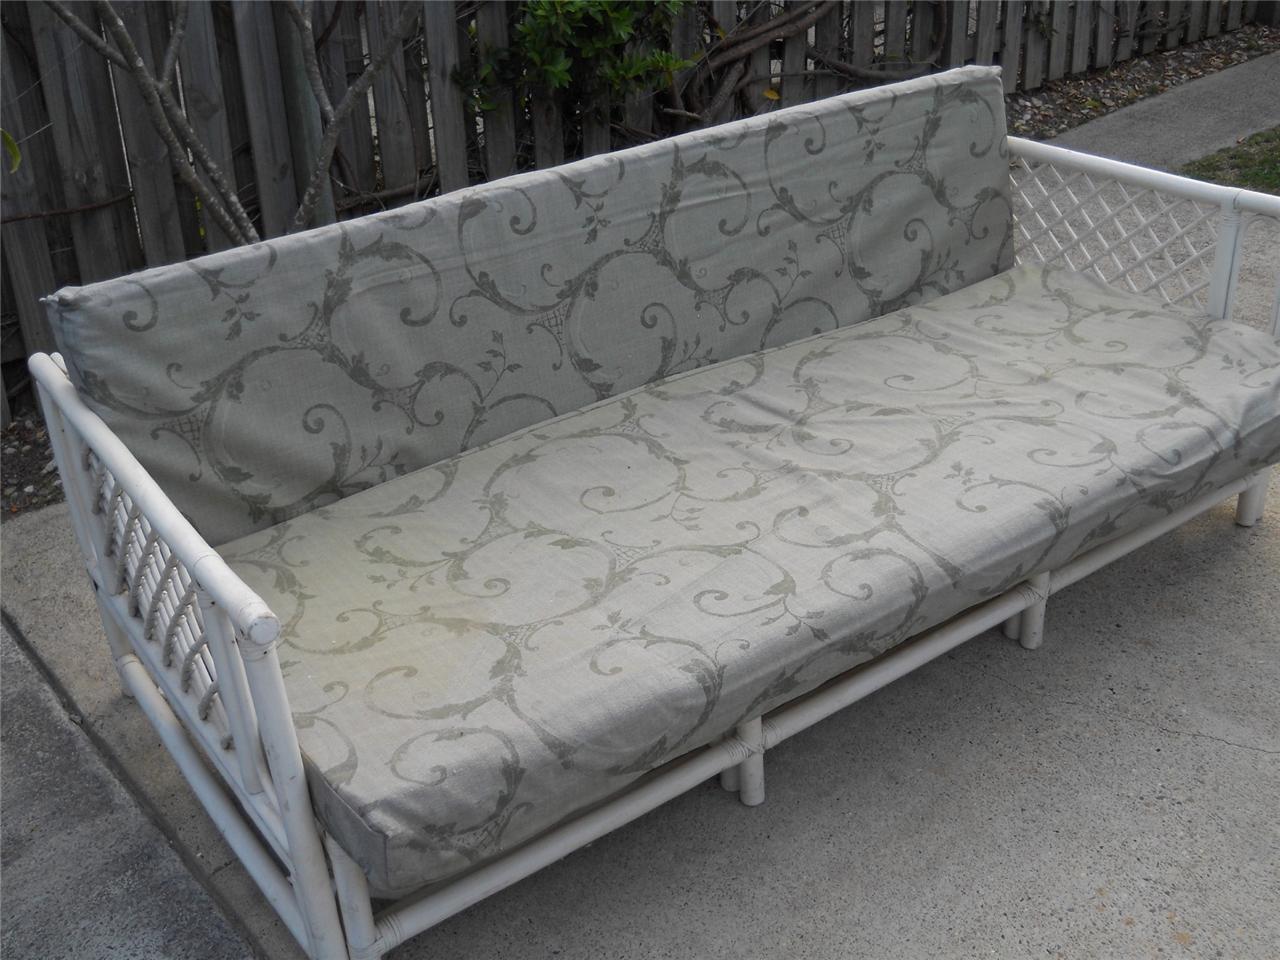 vintage cane wicker daybed divan shabby chic outdoor. Black Bedroom Furniture Sets. Home Design Ideas